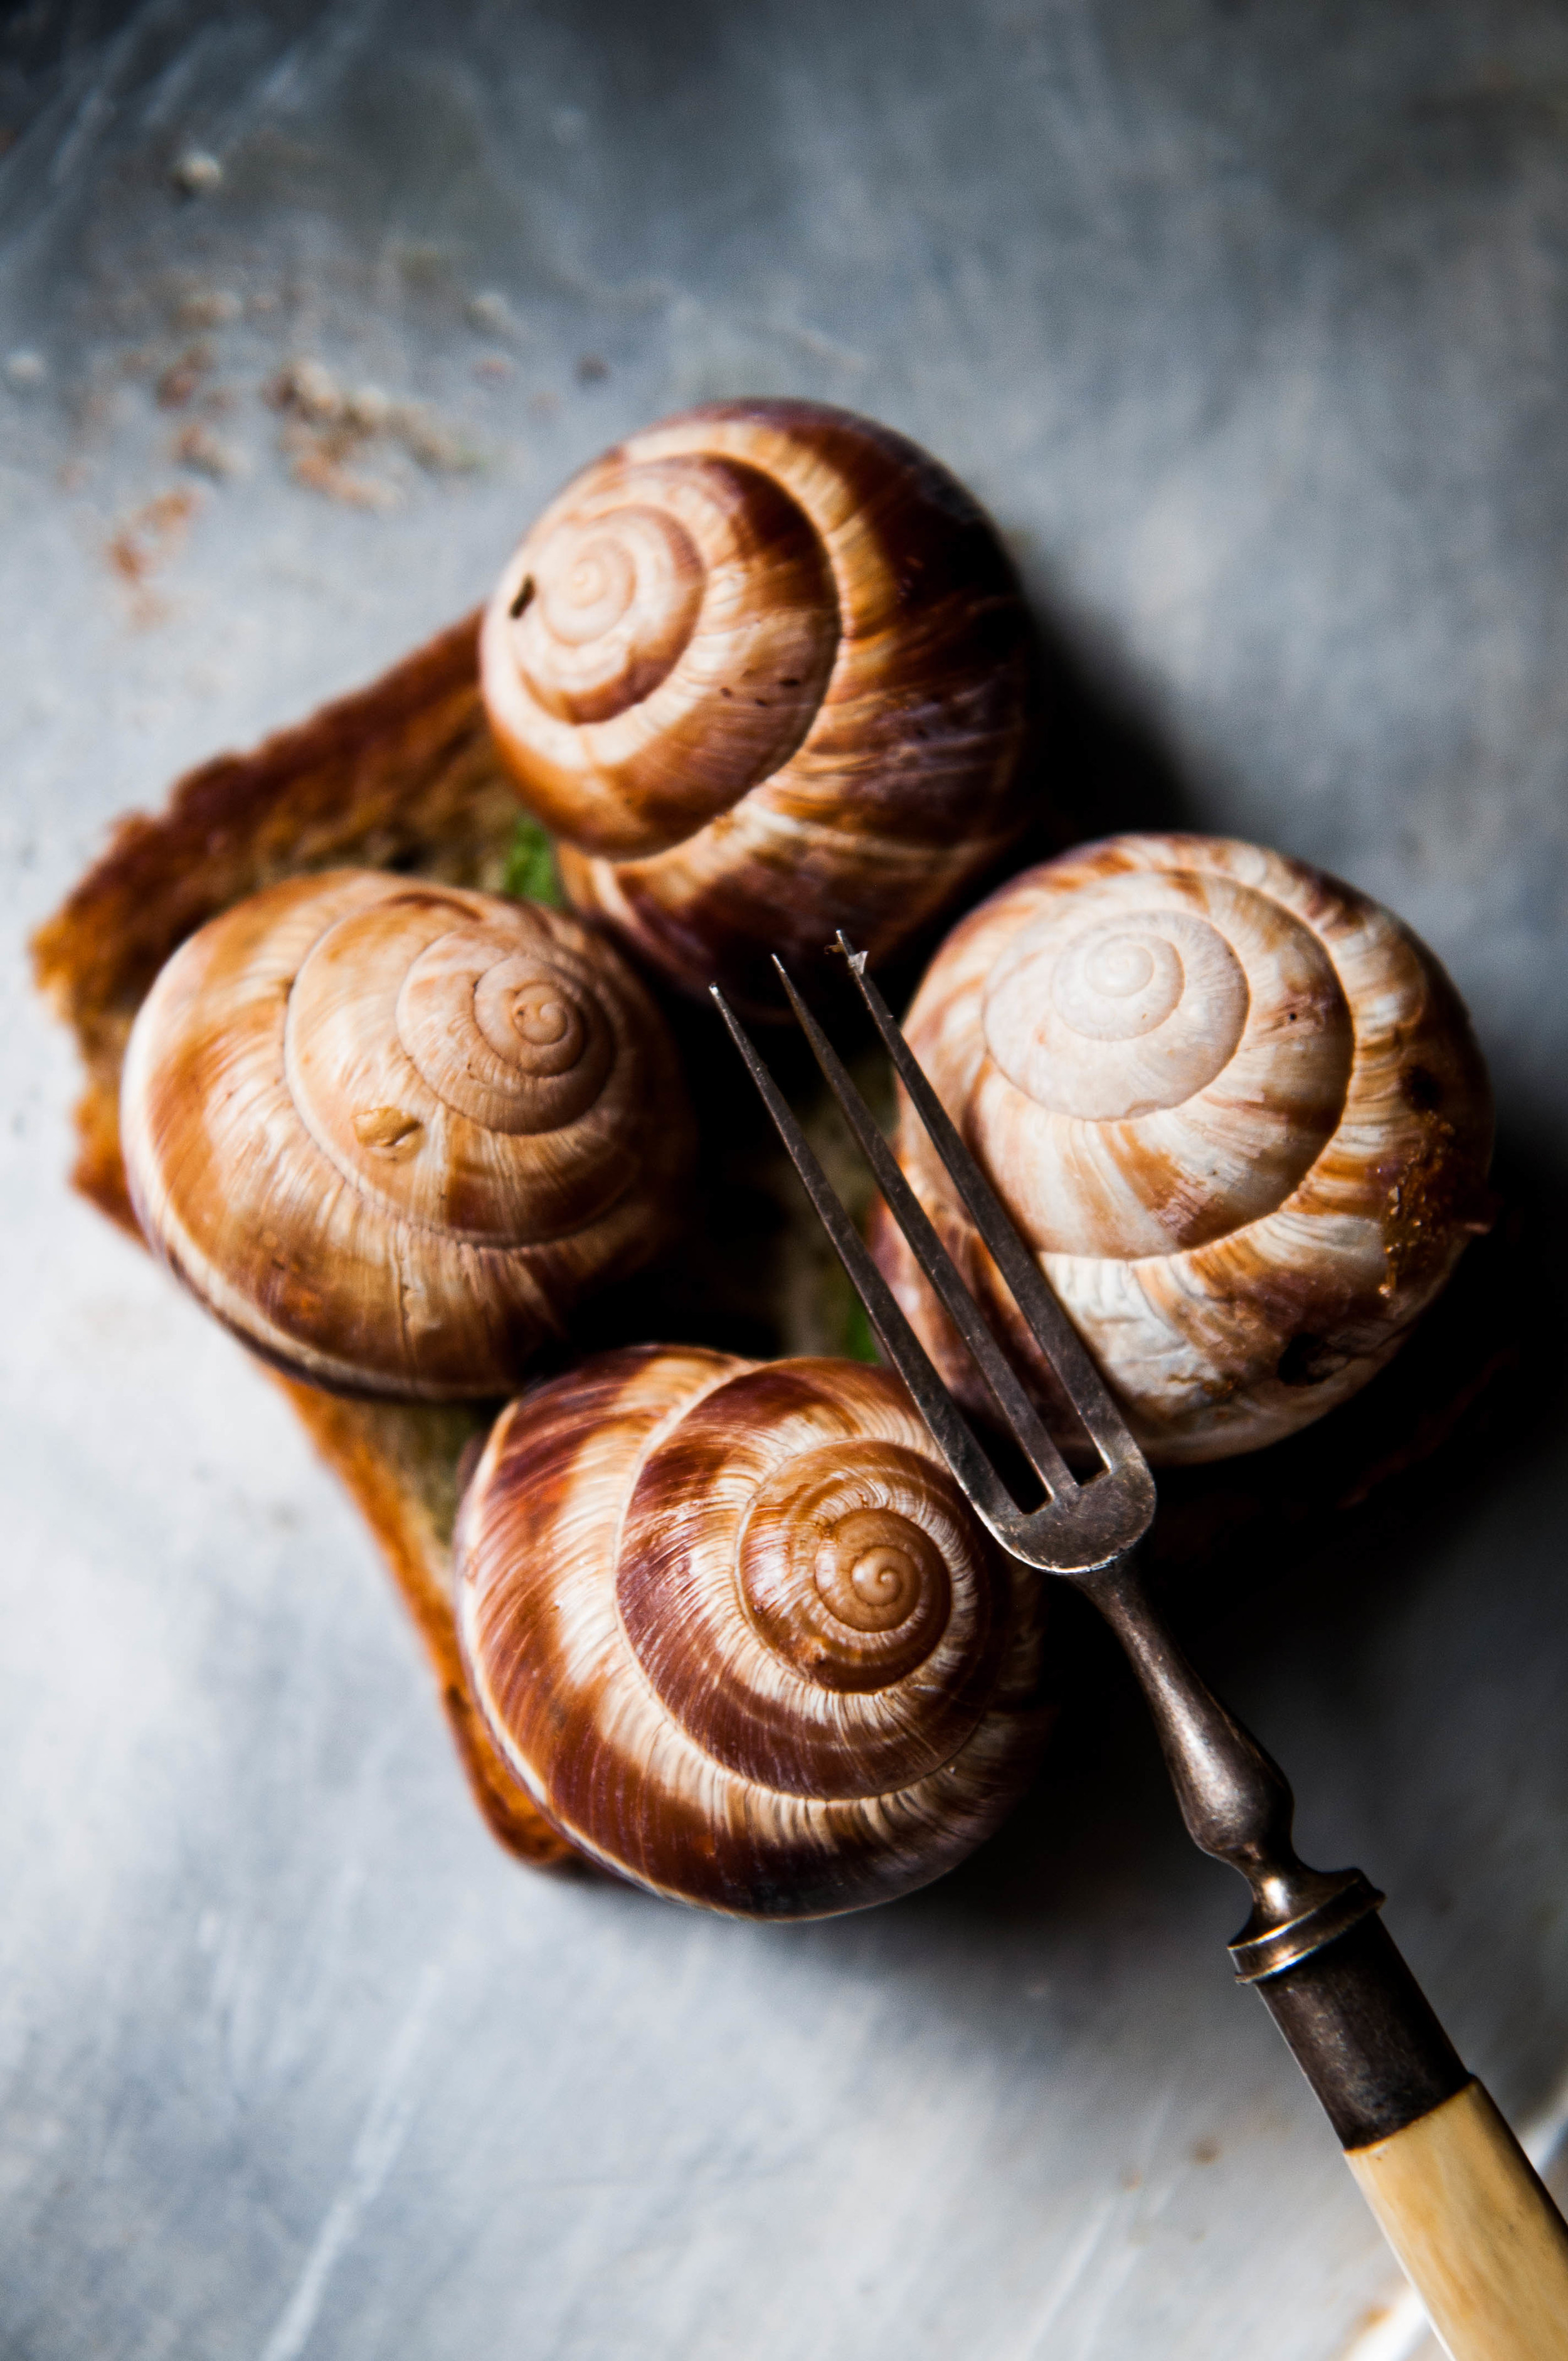 Roasted Escargots in Shell on Sourdough Toast